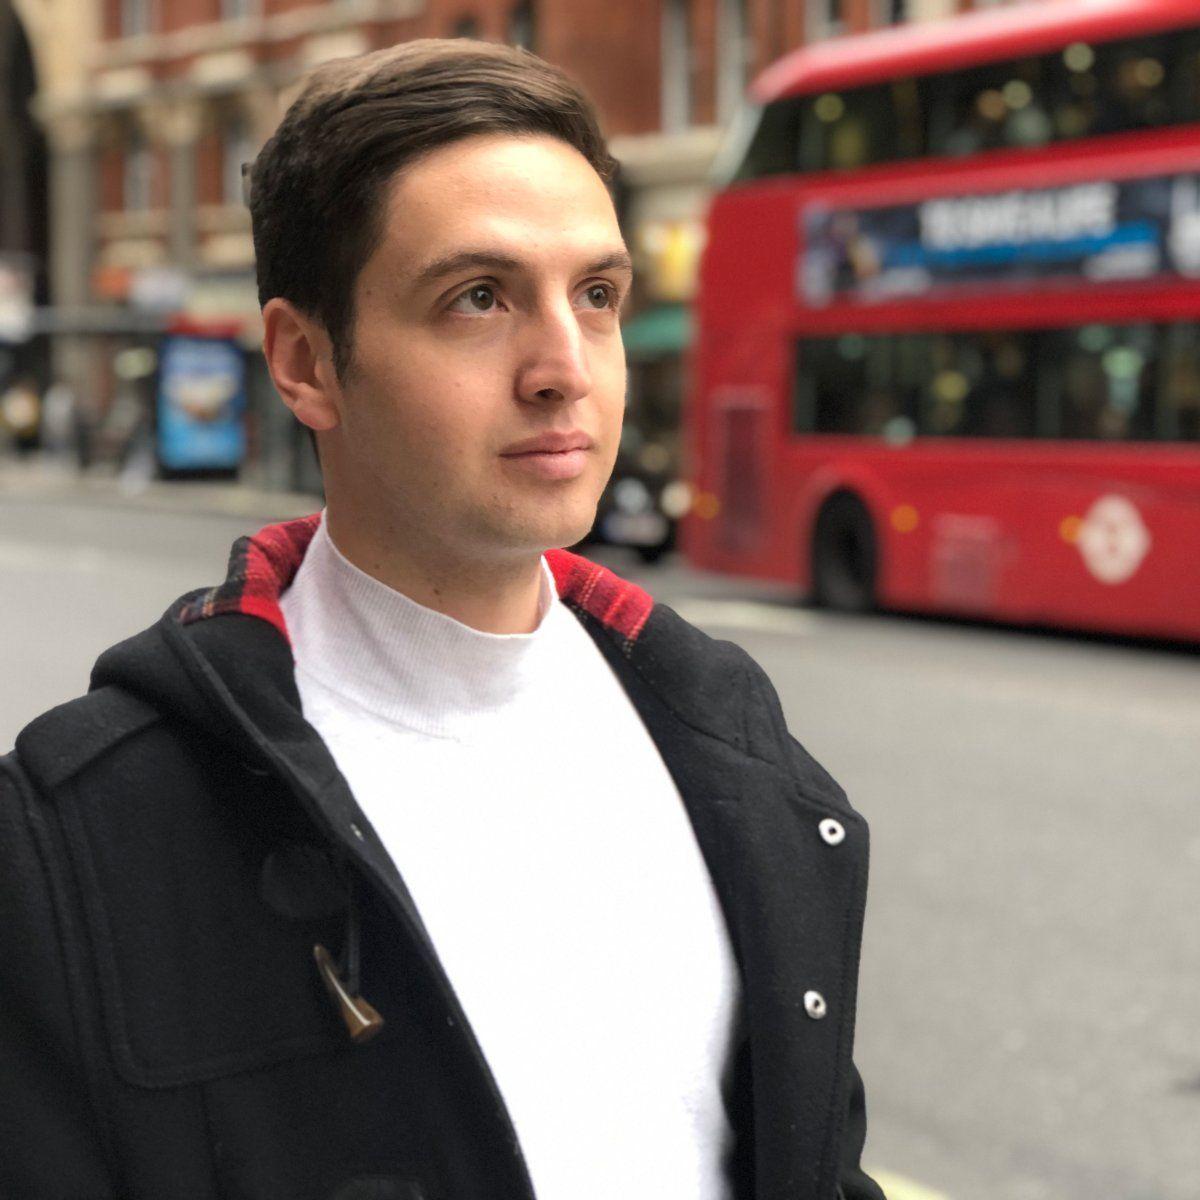 EINMALIGE VERWENDUNG Andrea Carlo, 22, aus London